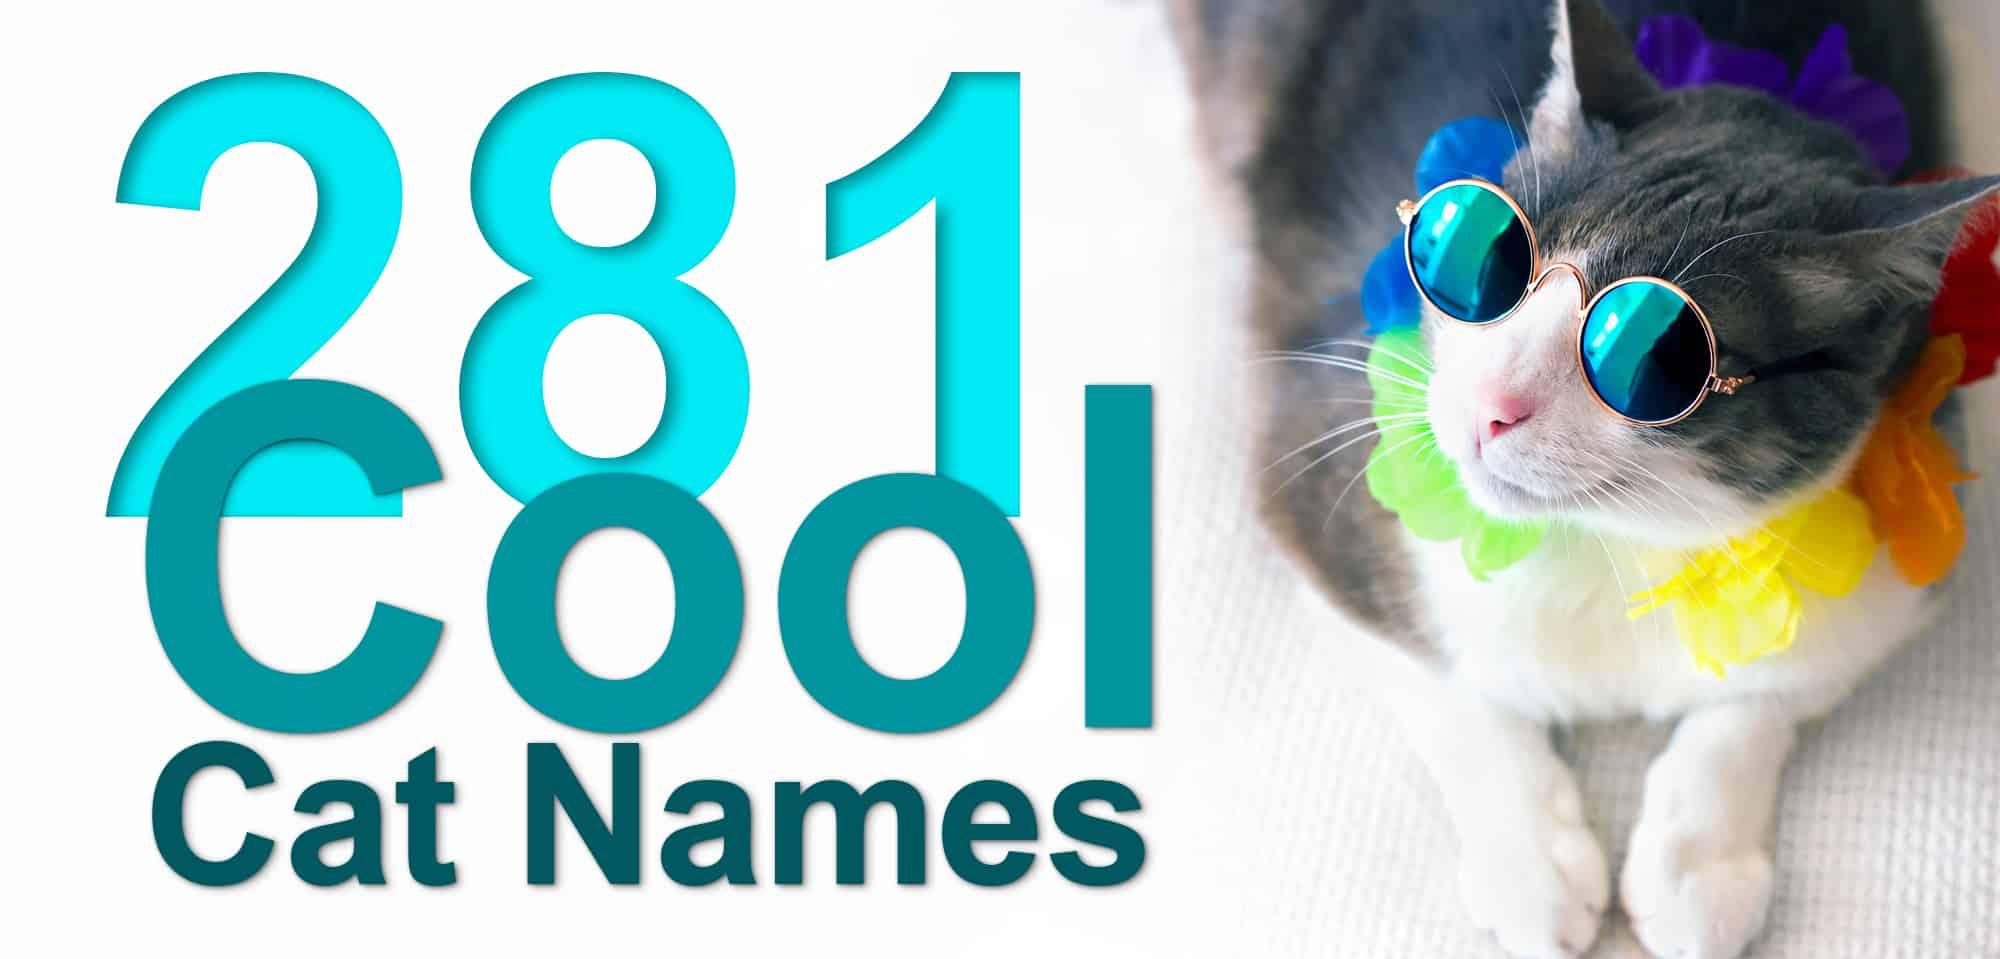 Cool Cat Names